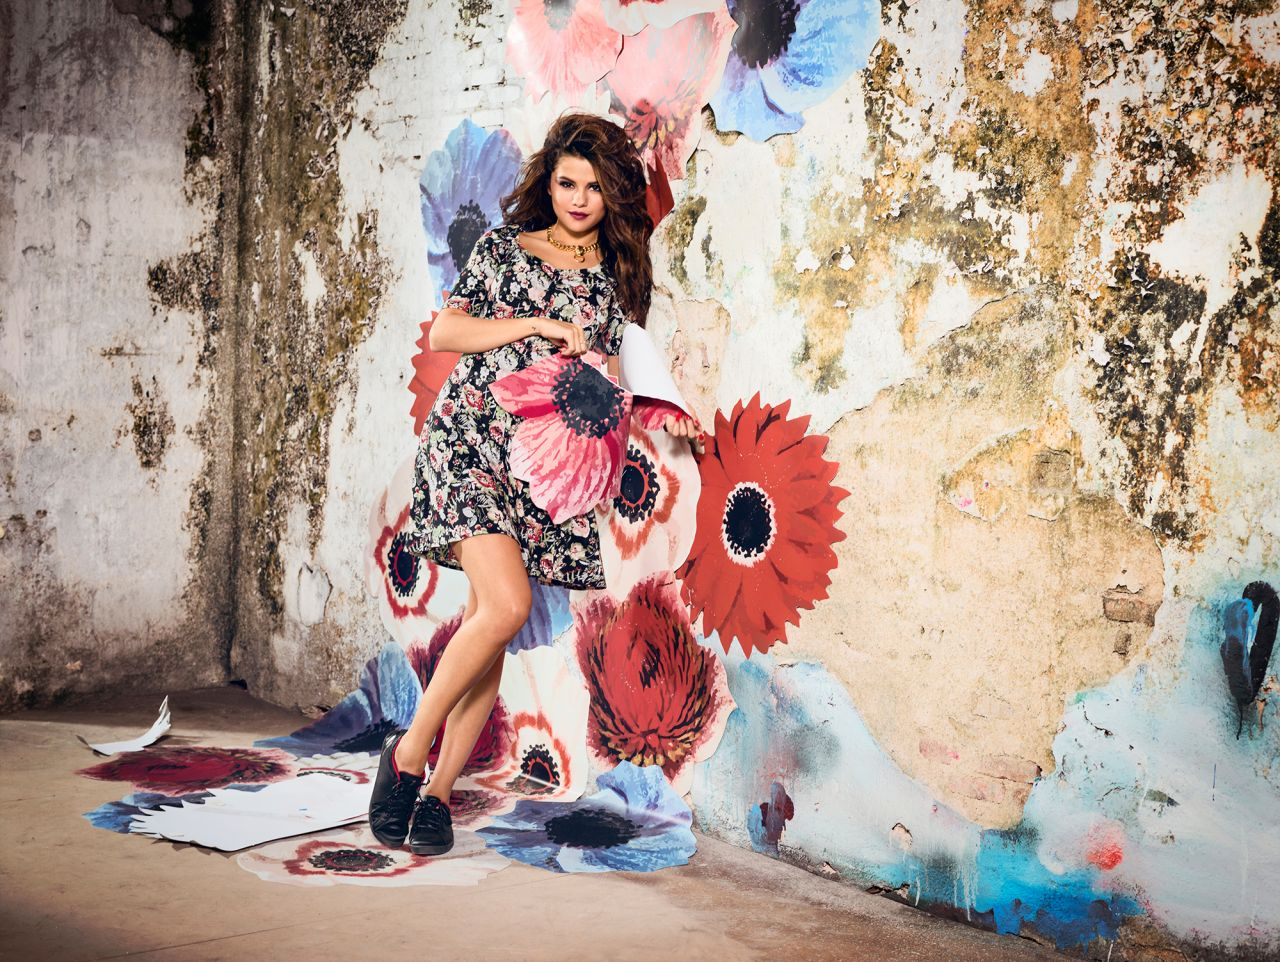 Selena gomez photoshoot adidas neo spring summer 2014 collection - Photo selena gomez 2014 ...